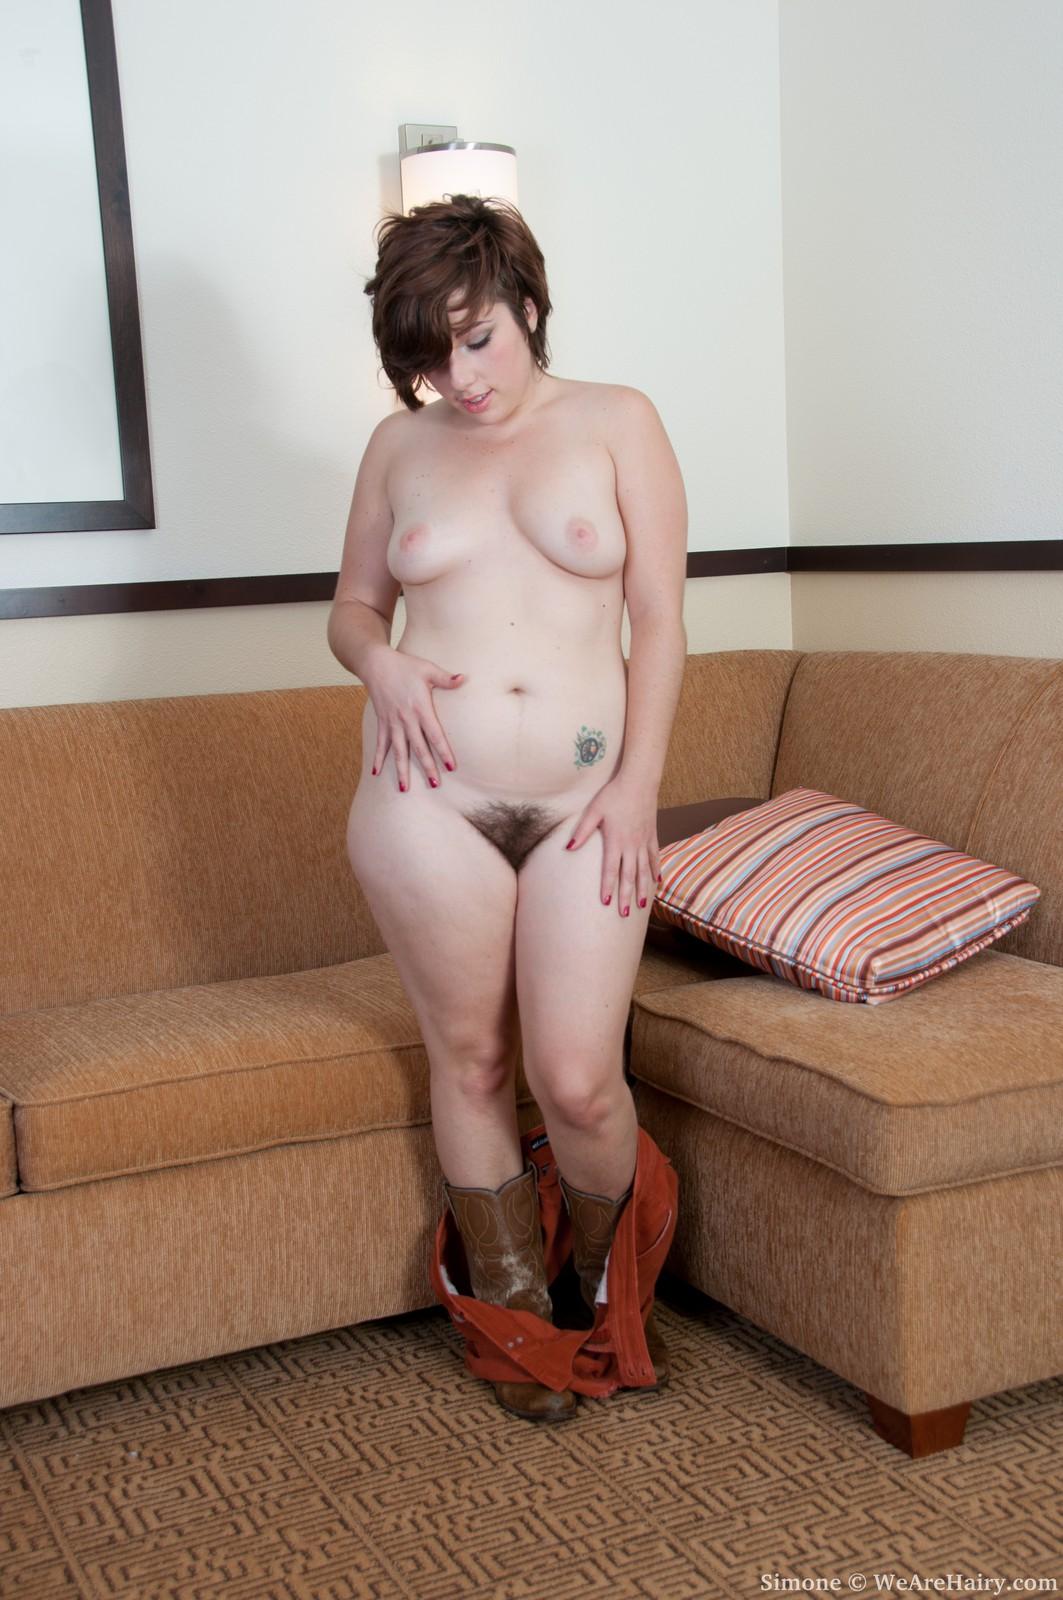 Симоны фото sex 15 фотография